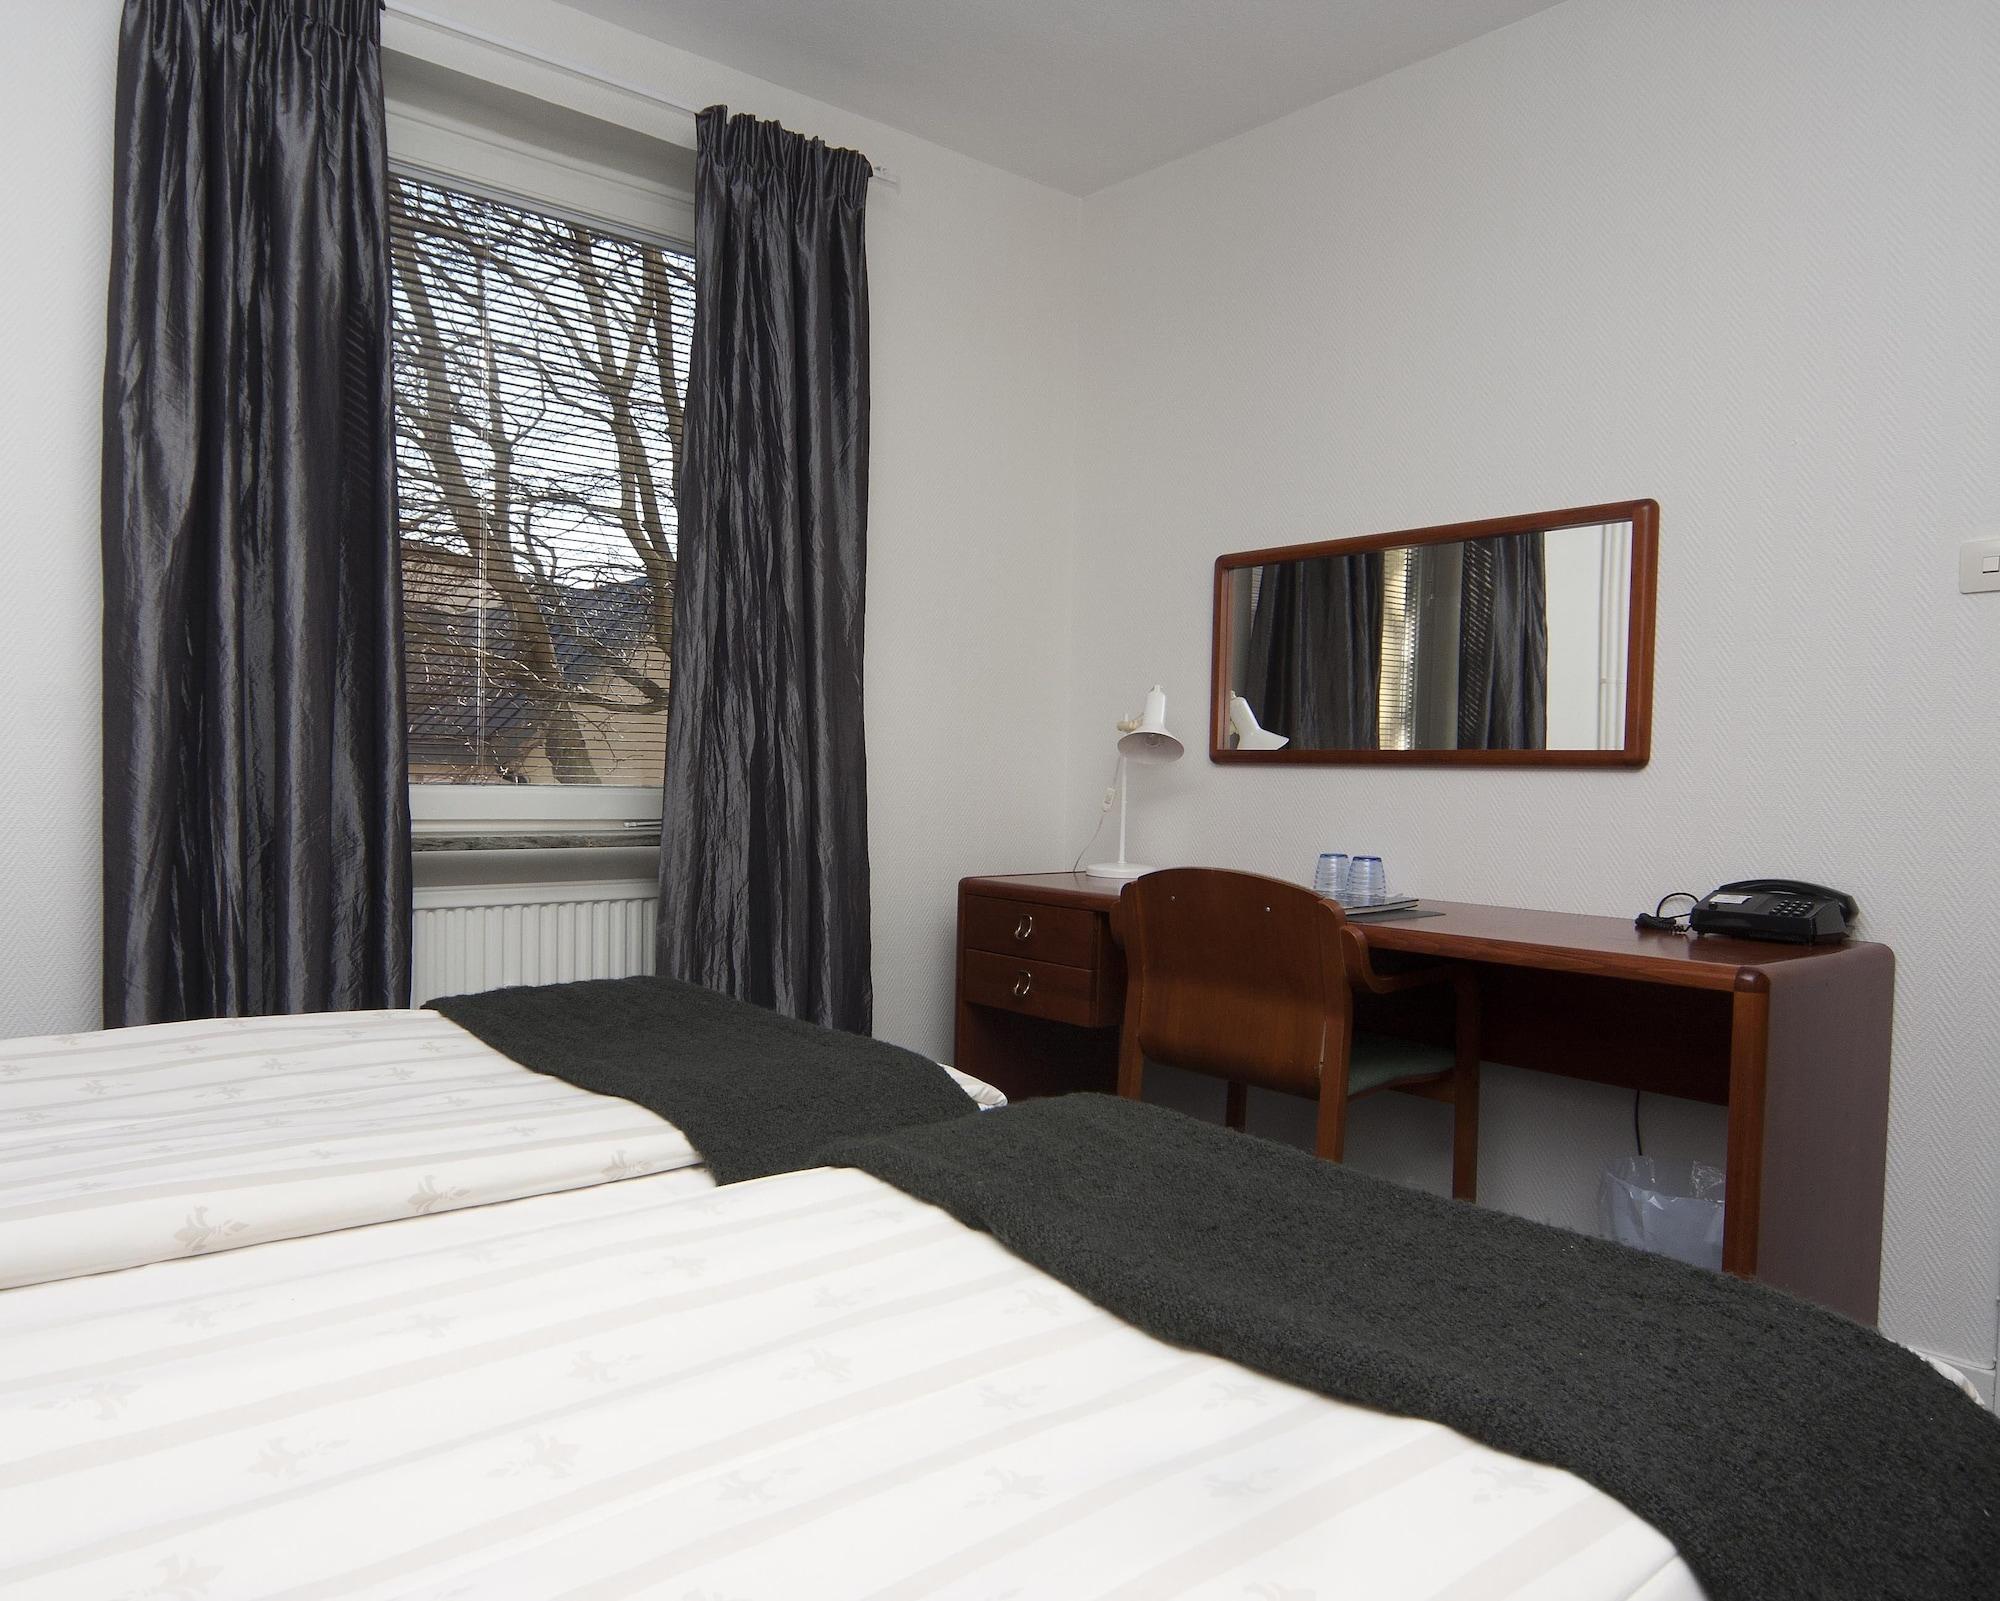 Hotel Aveny Bed & Breakfast, Gävle